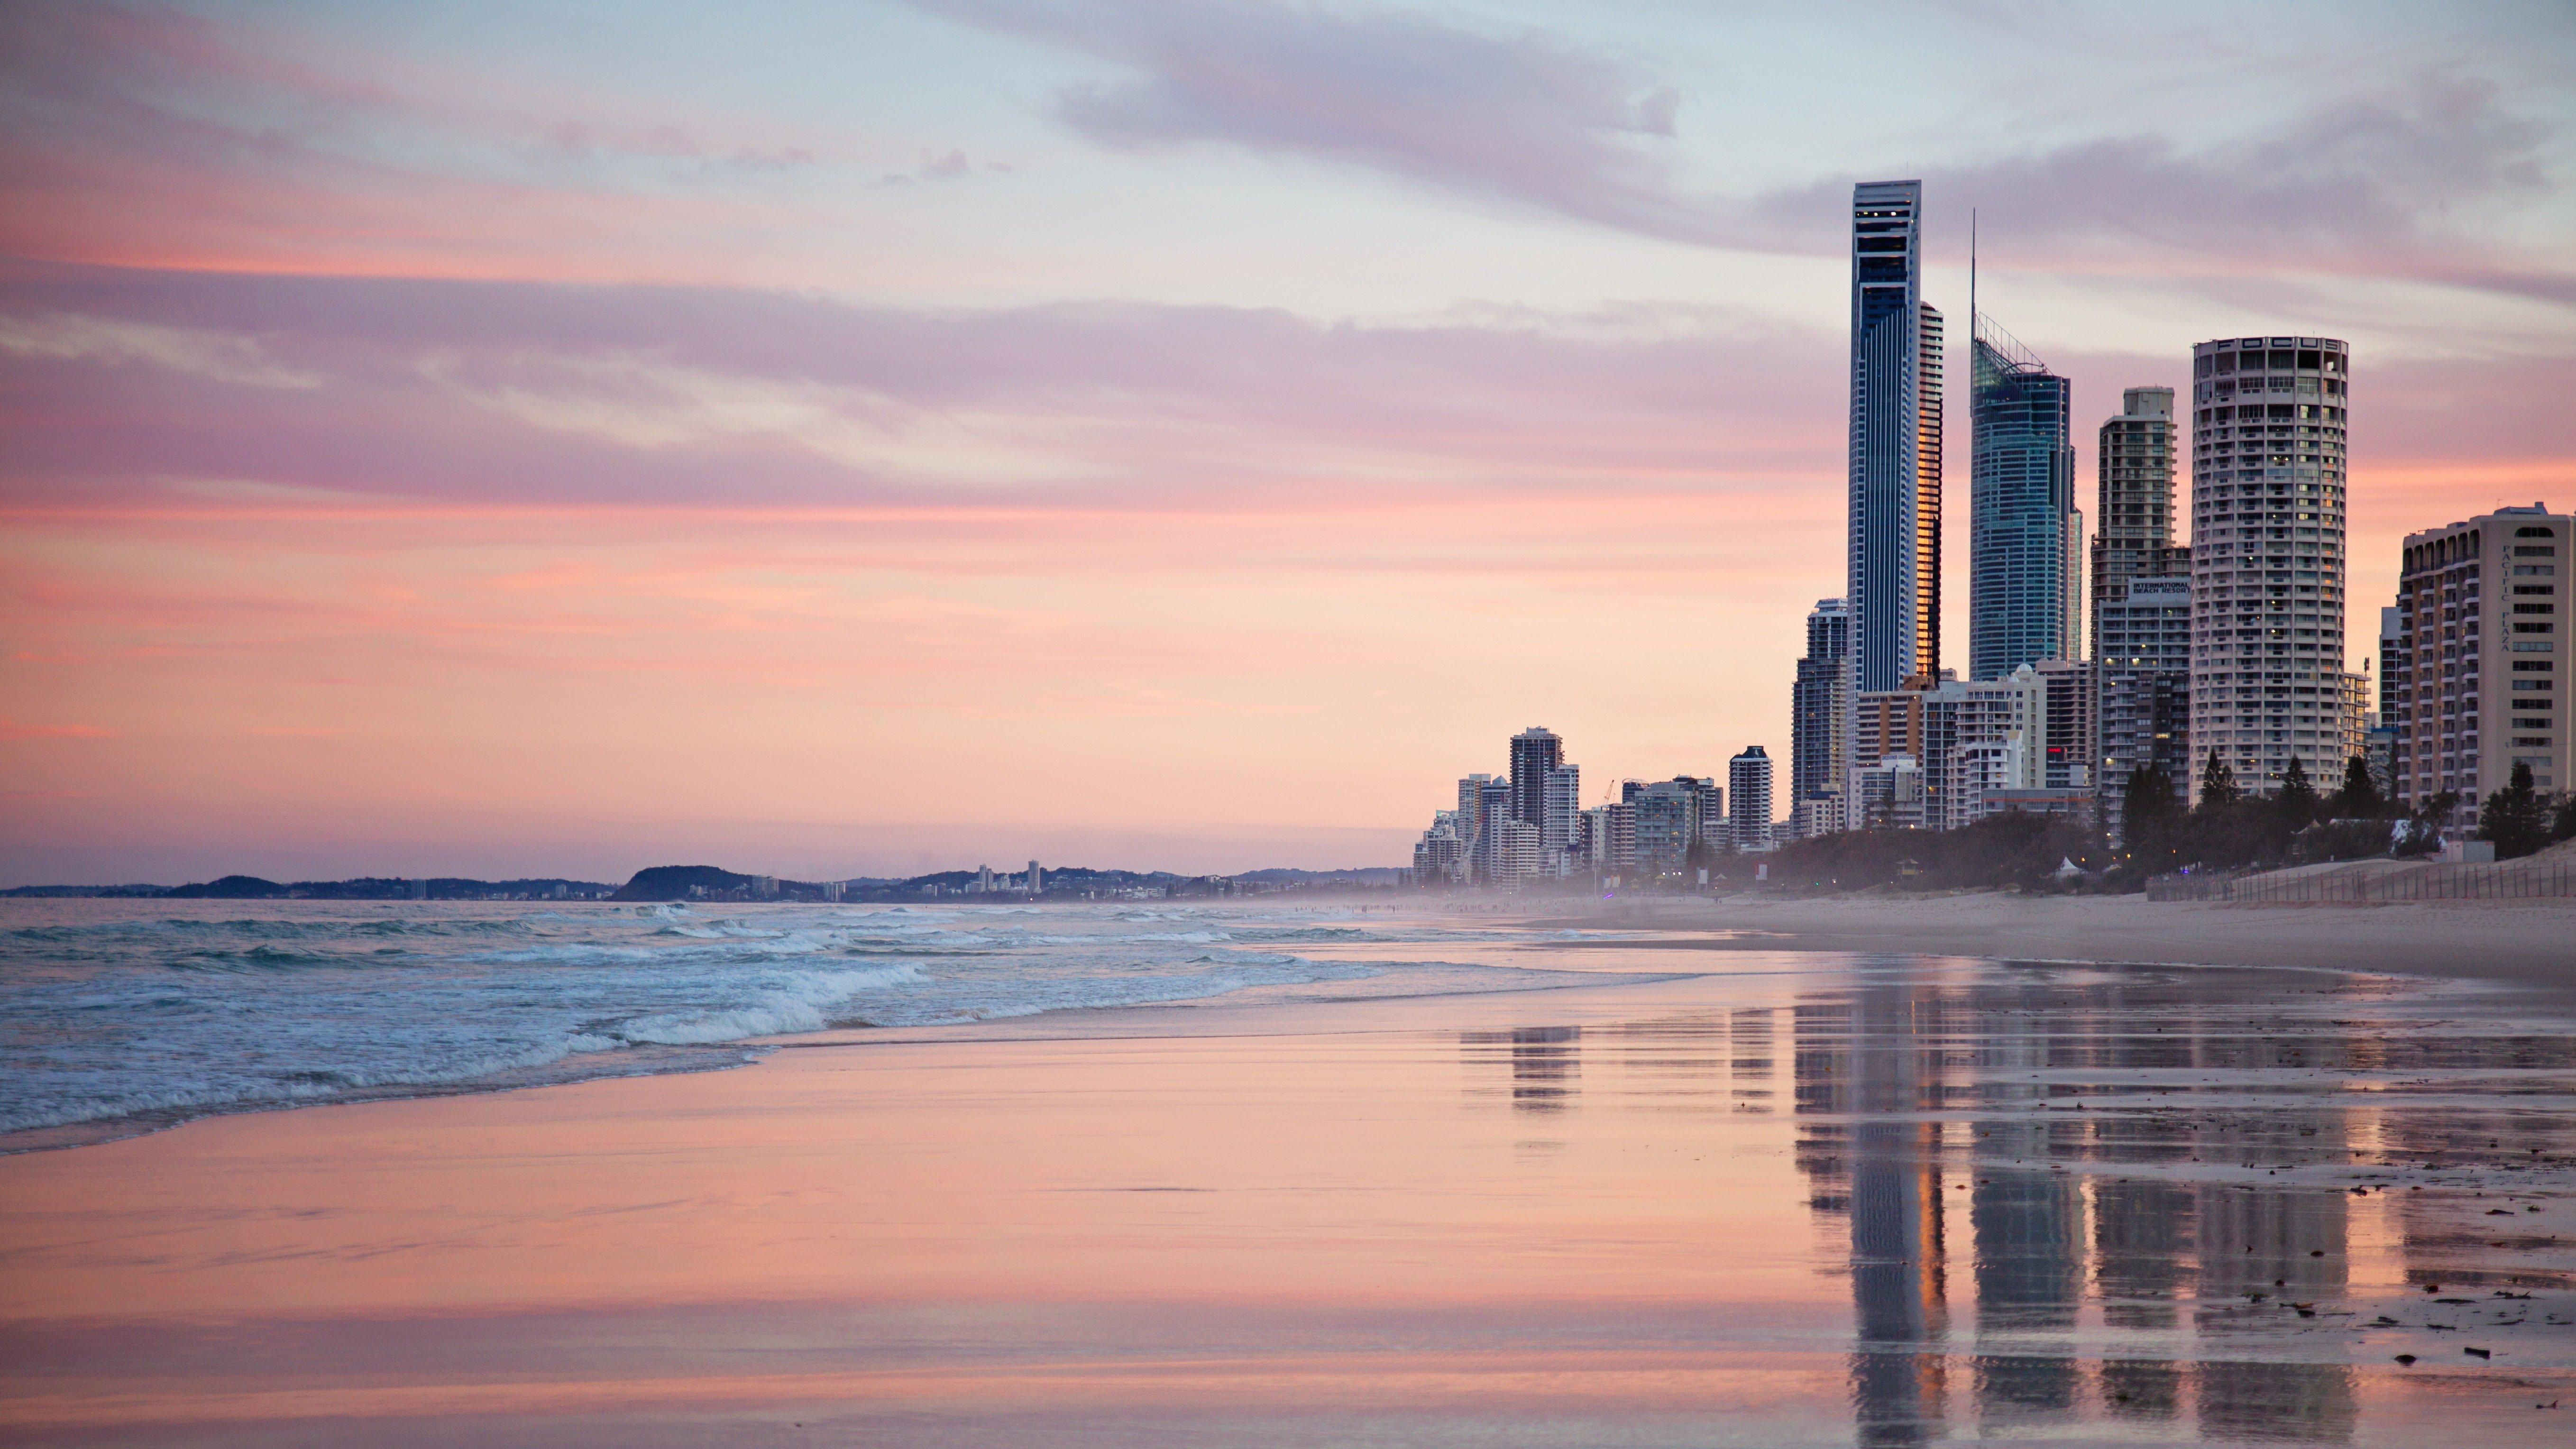 architecture-australia-backlit-634010